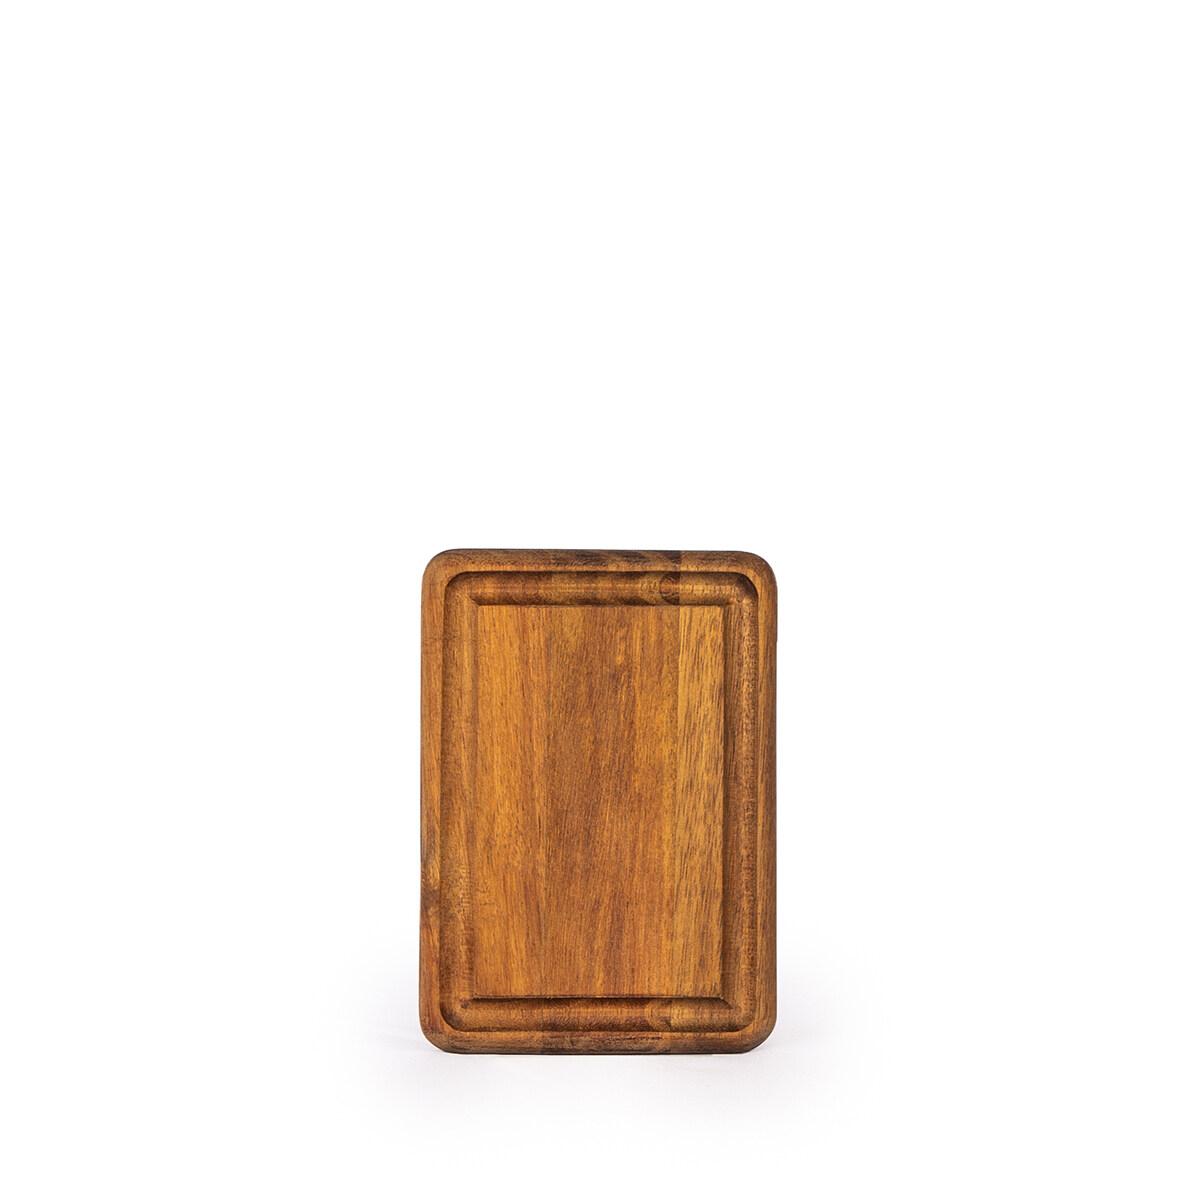 AIDEAS Cutting Board- YUMMY serving / chopping / wood / natural / platter / plate / acacia / dessert / coffee / dinner